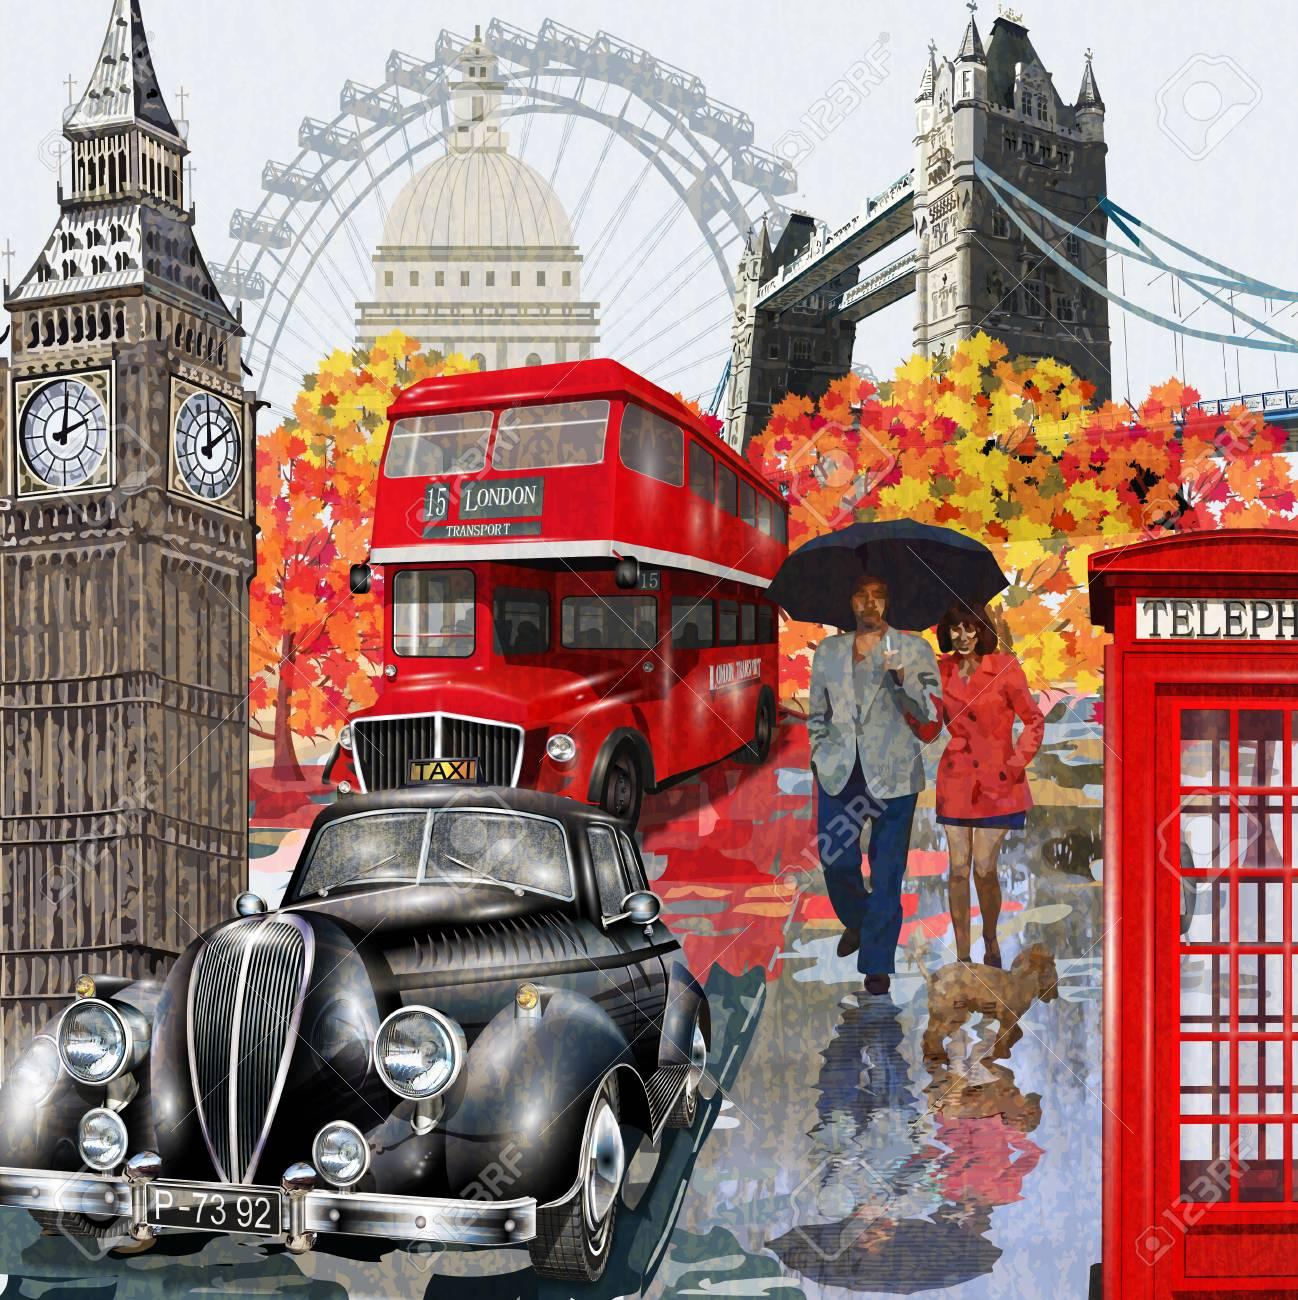 London vintage poster. - 82718199